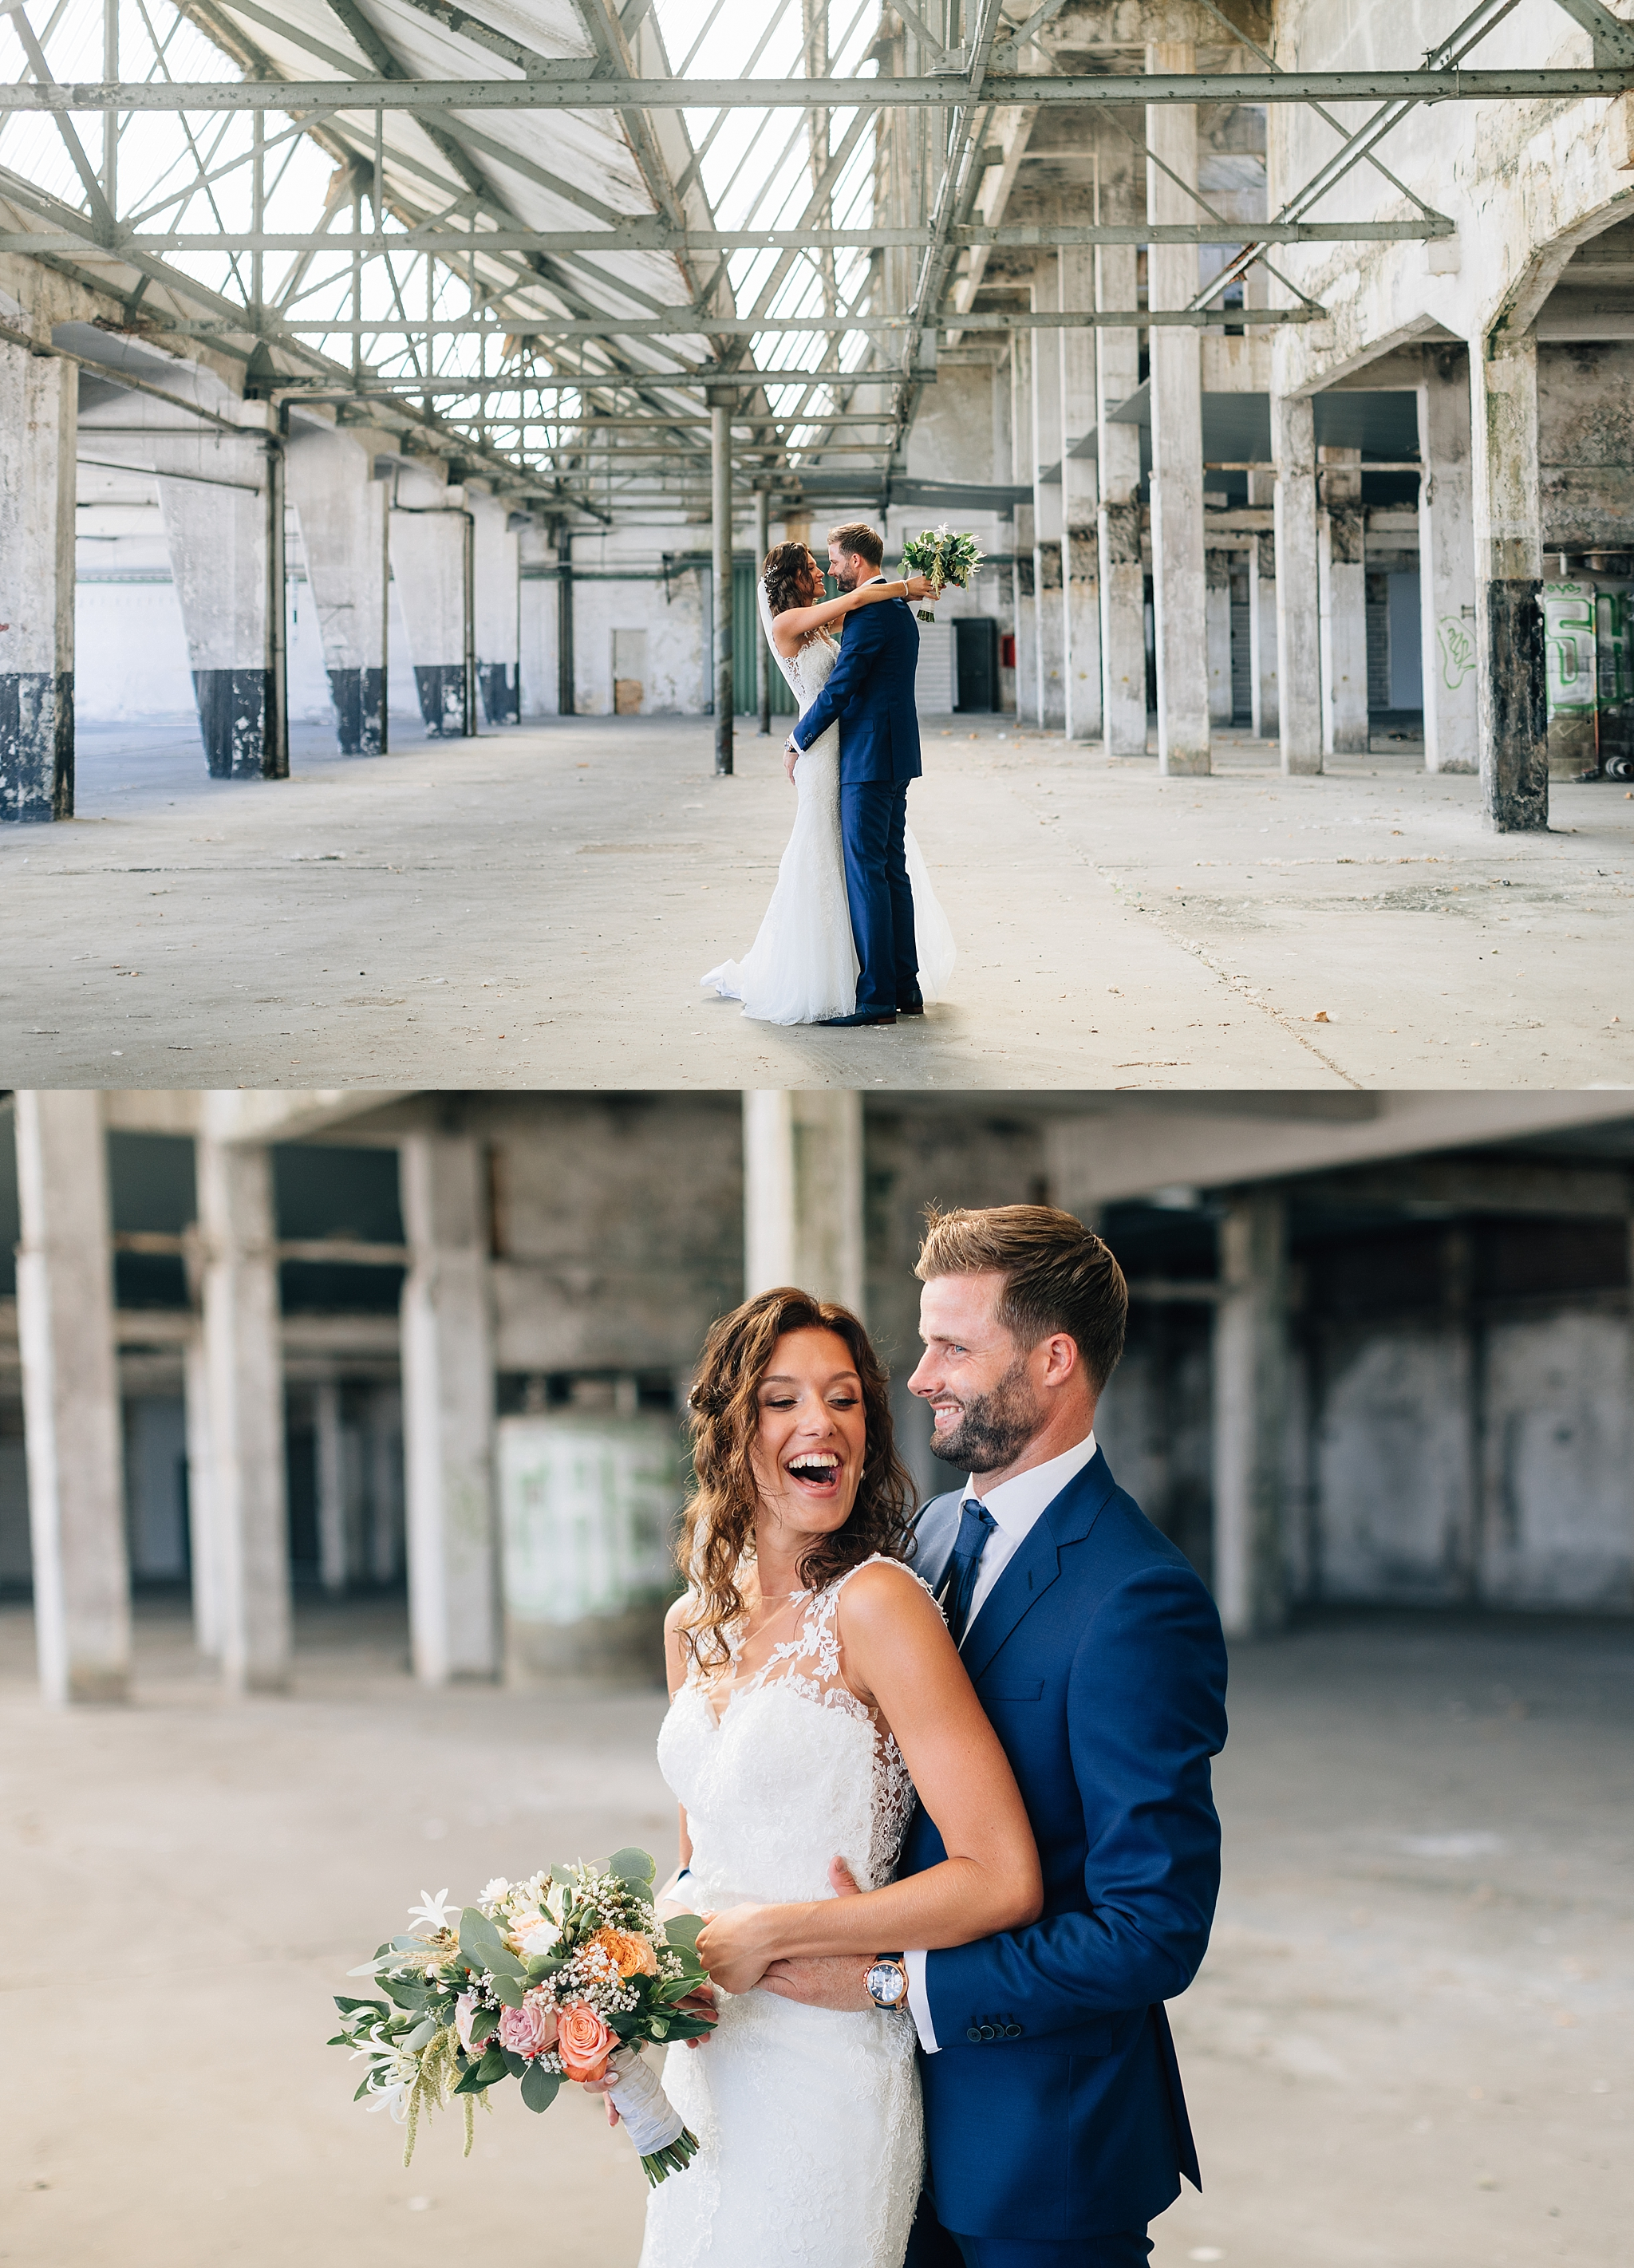 Bas + Jody's Wedding | Nijmegen, HollandHeather Wall Photography